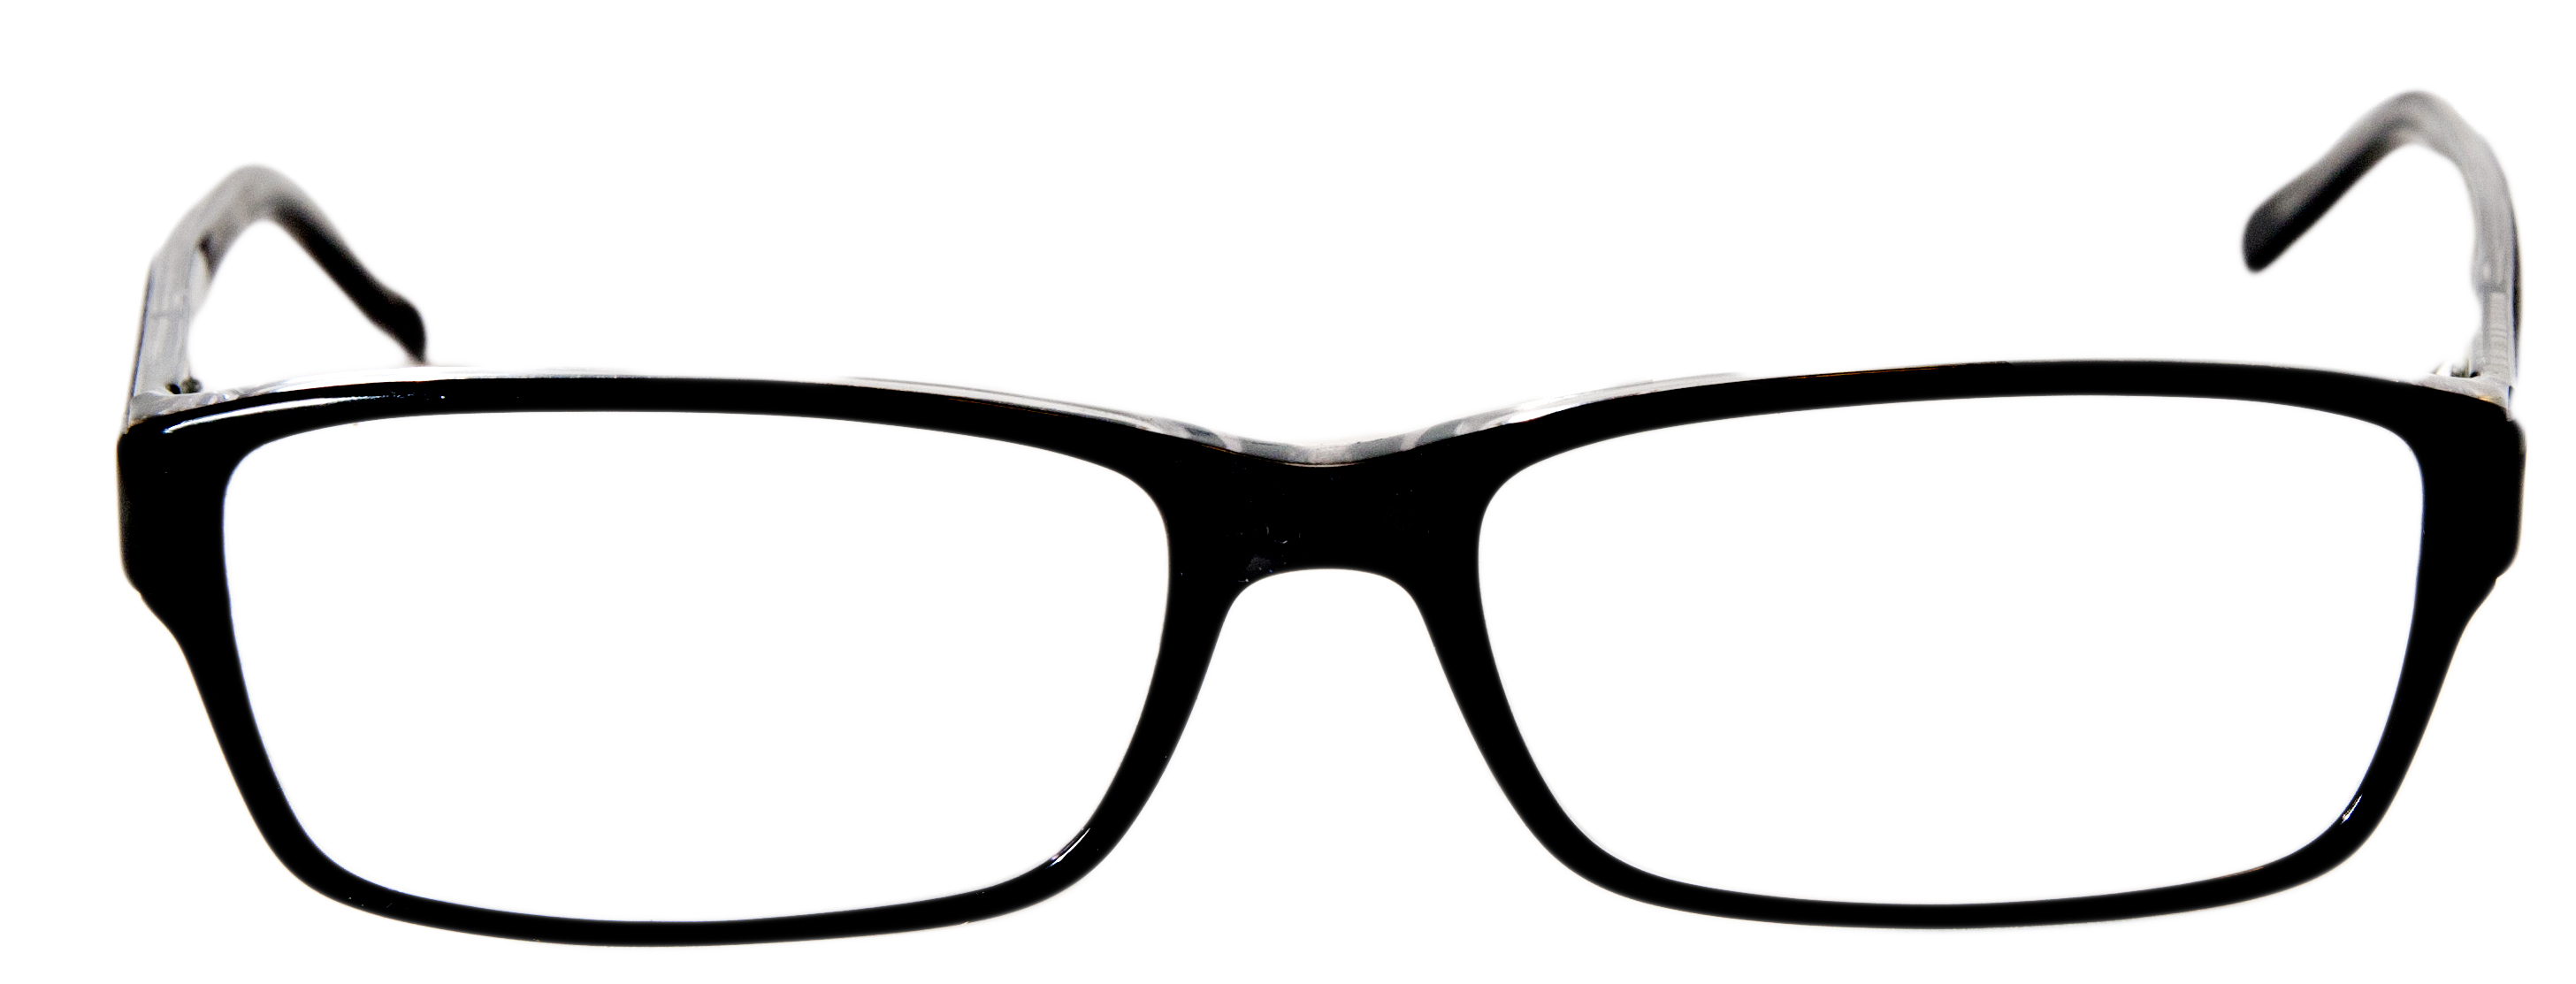 Eyeglasses clipart stylish glass. Free eye glasses download